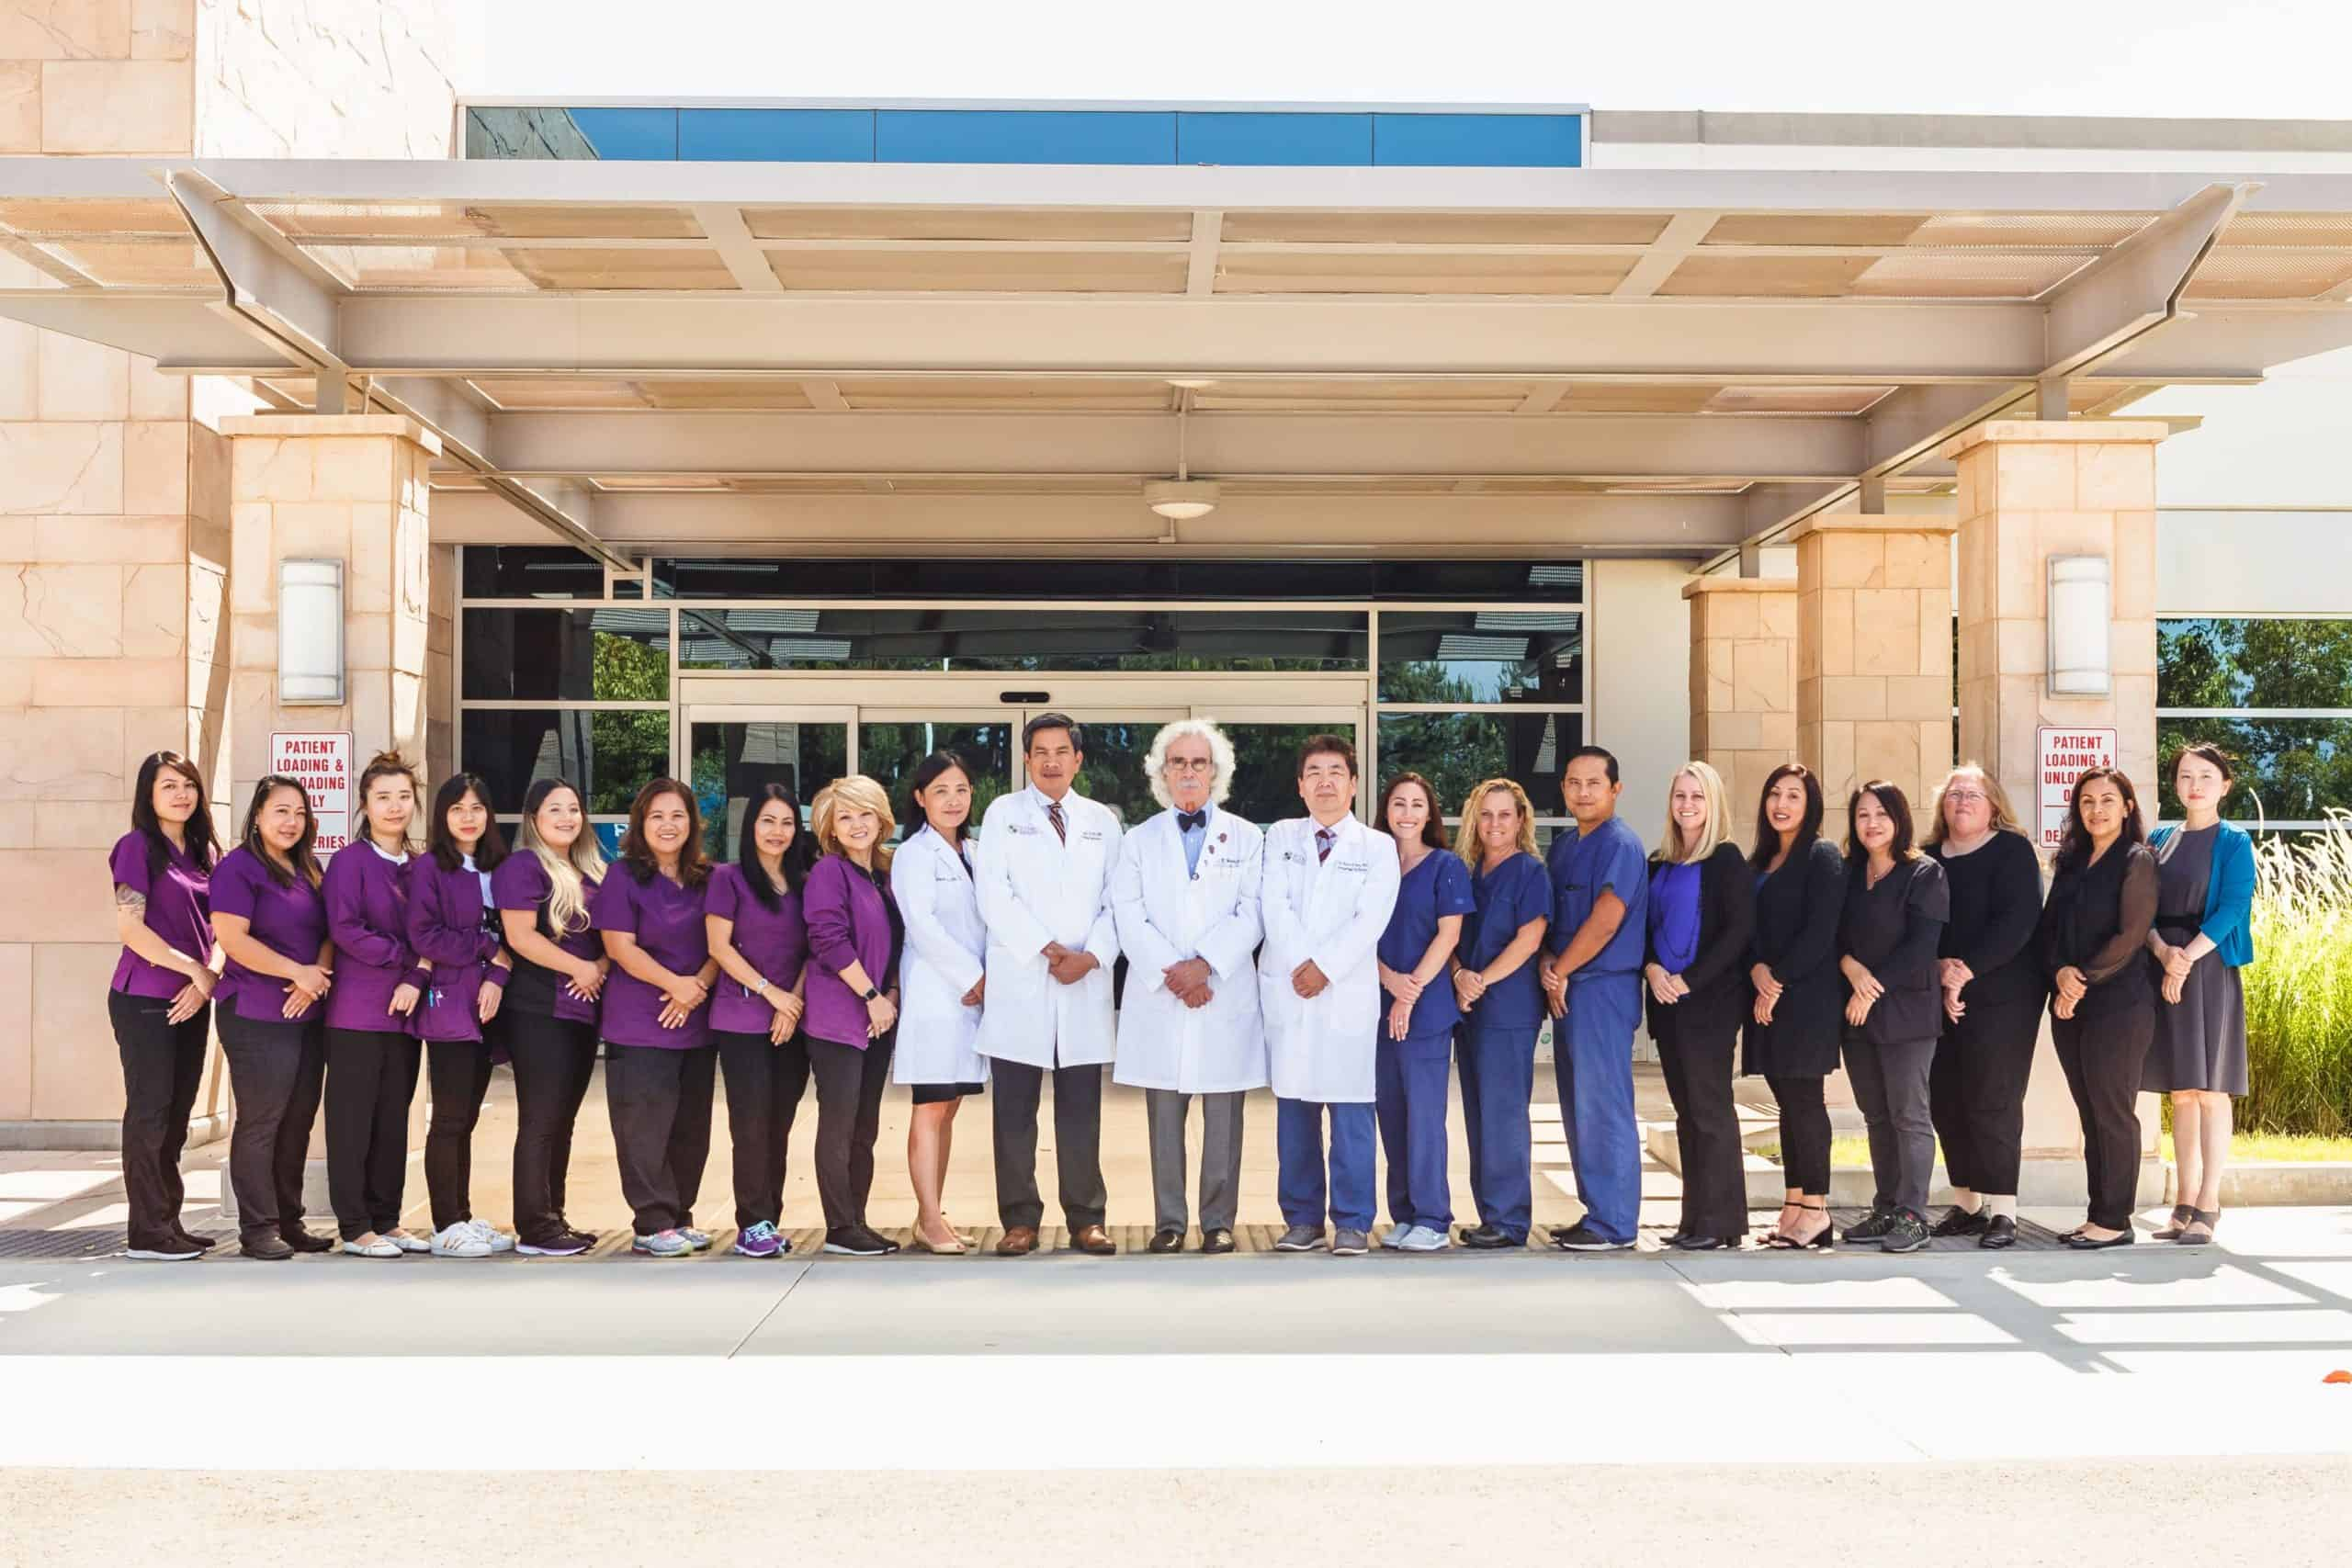 Coastal Fertility Medical Center Receives Accreditation from CAP